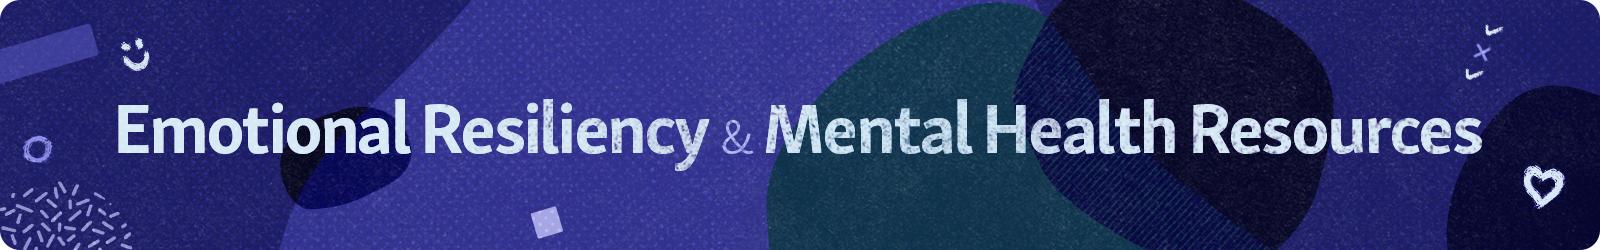 Mental Health and Emotional Resiliency Resource Header art